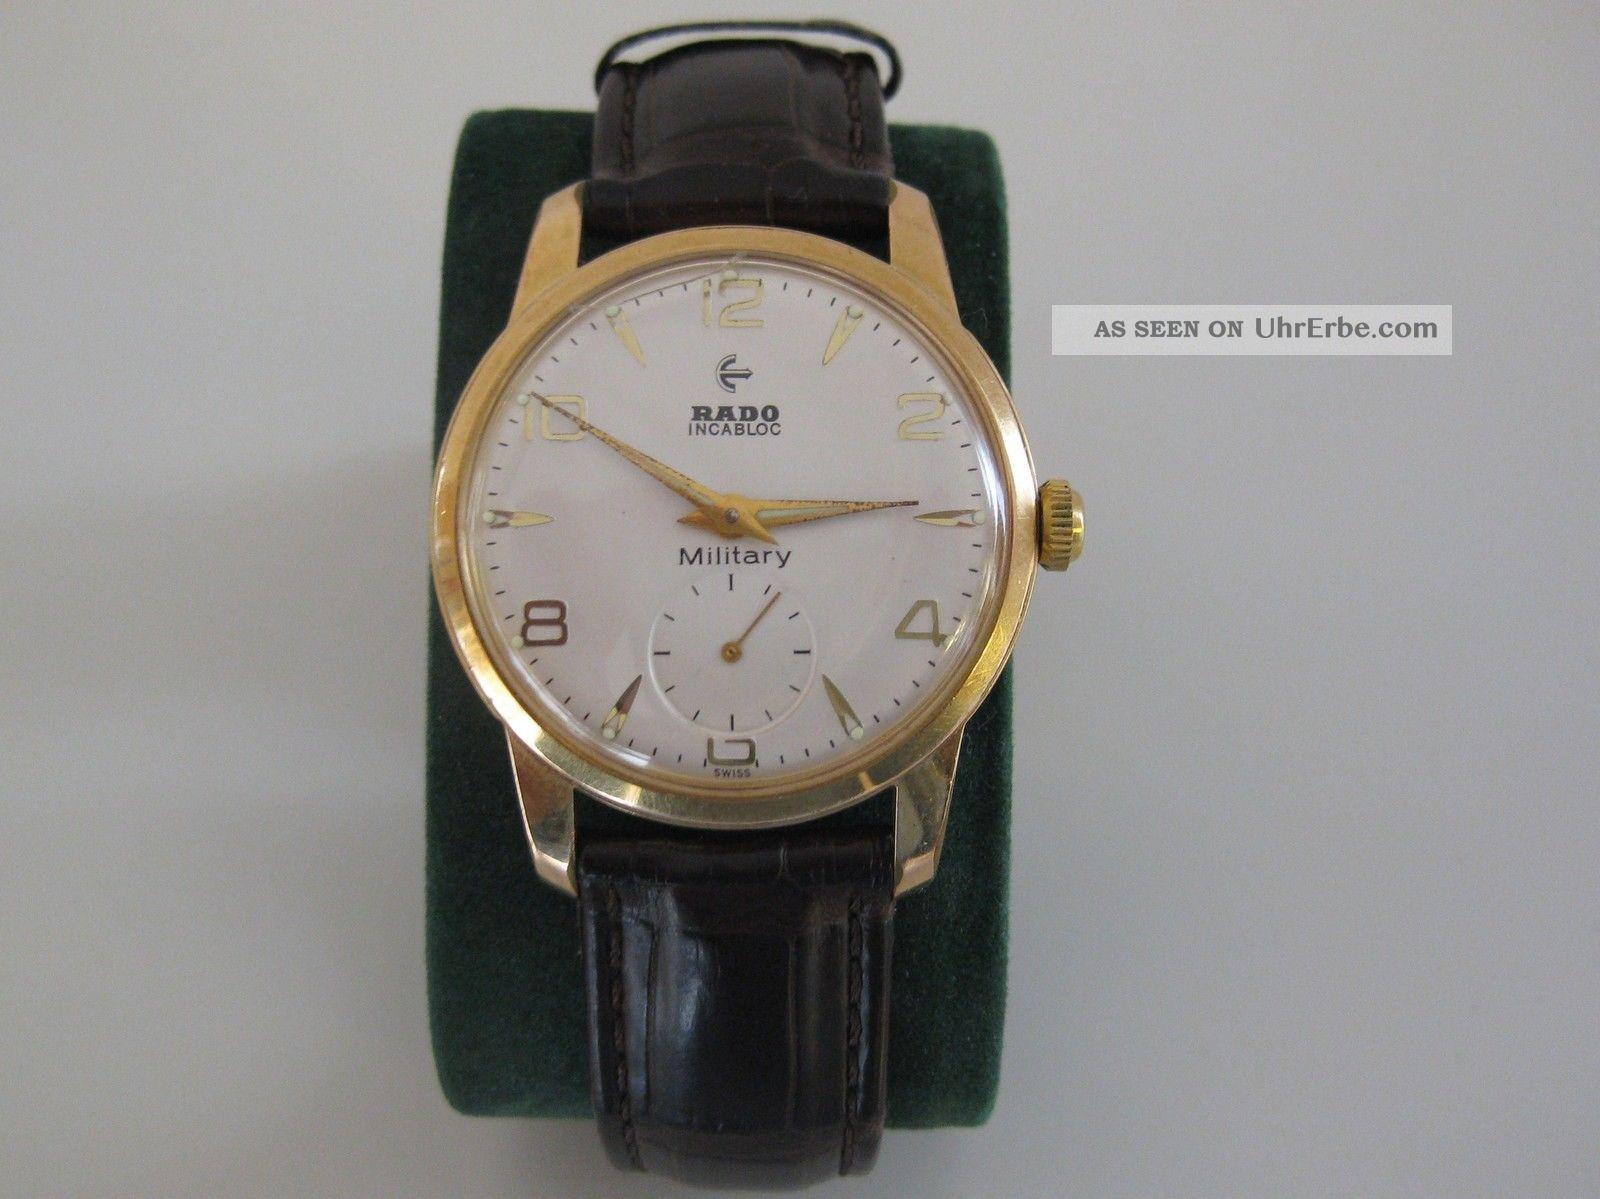 Rado Military Uhr Mit Mechanischem Handaufzug Swiss Made Armbanduhren Bild